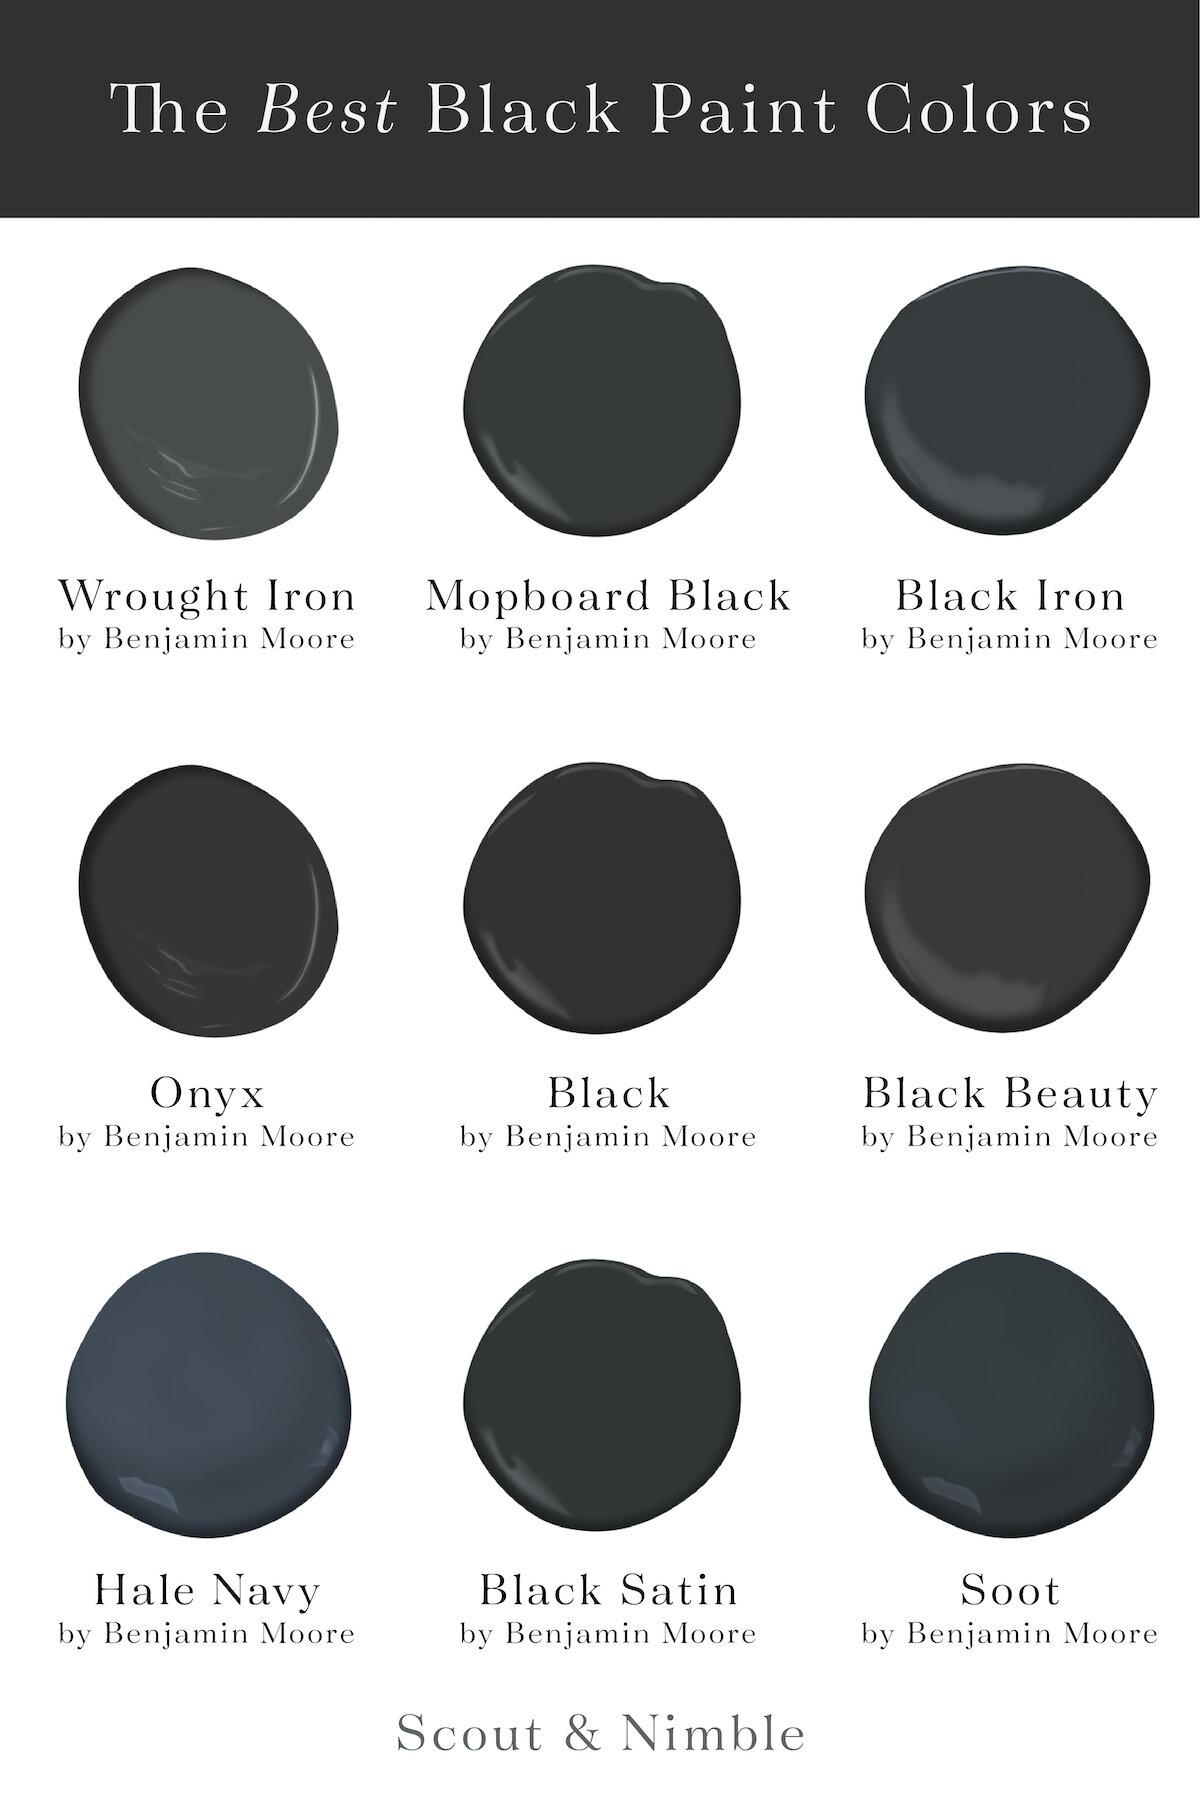 Benjamin Moore Blackberry : benjamin, moore, blackberry, Moody, Vibes, Black, Paint, Colors, Scout, Nimble